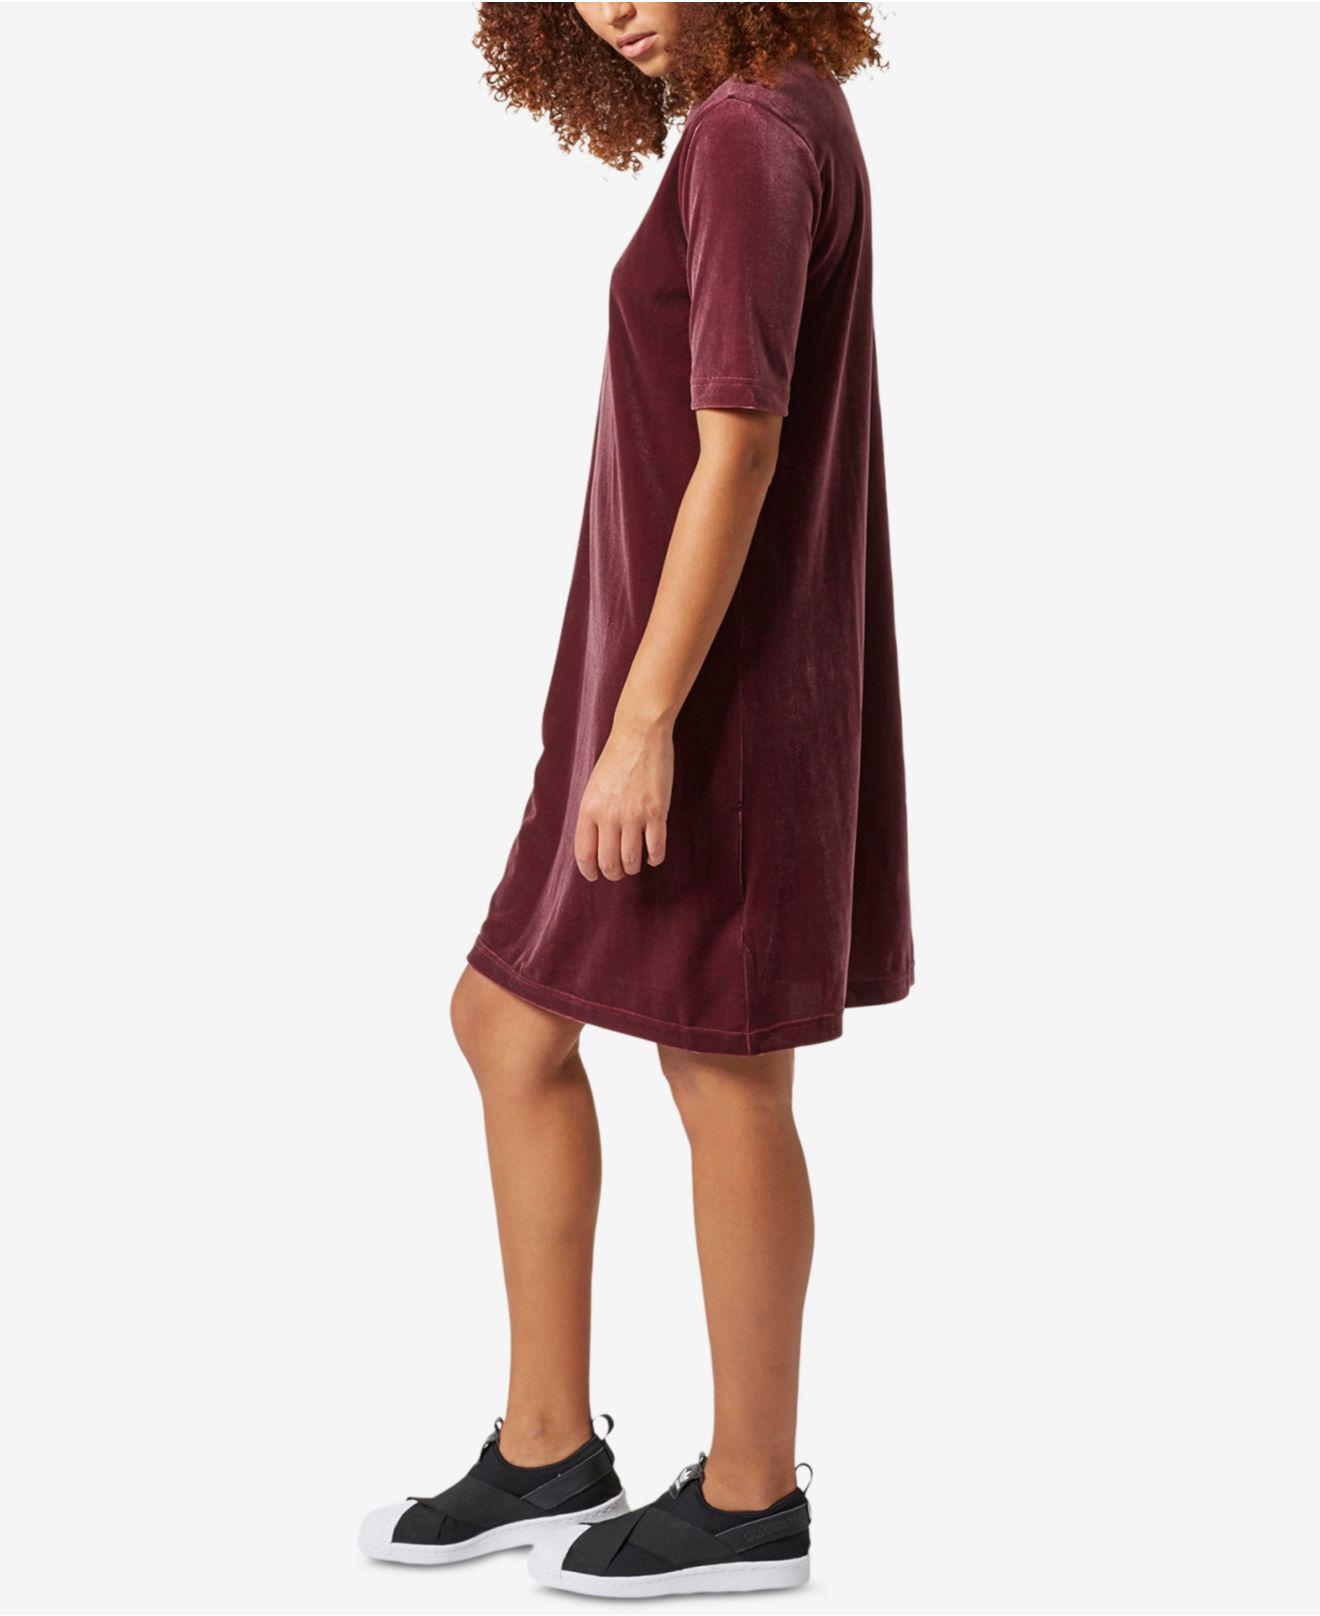 cfcefe4eeea4 Lyst - adidas Originals Velvet Vibes Short Dress